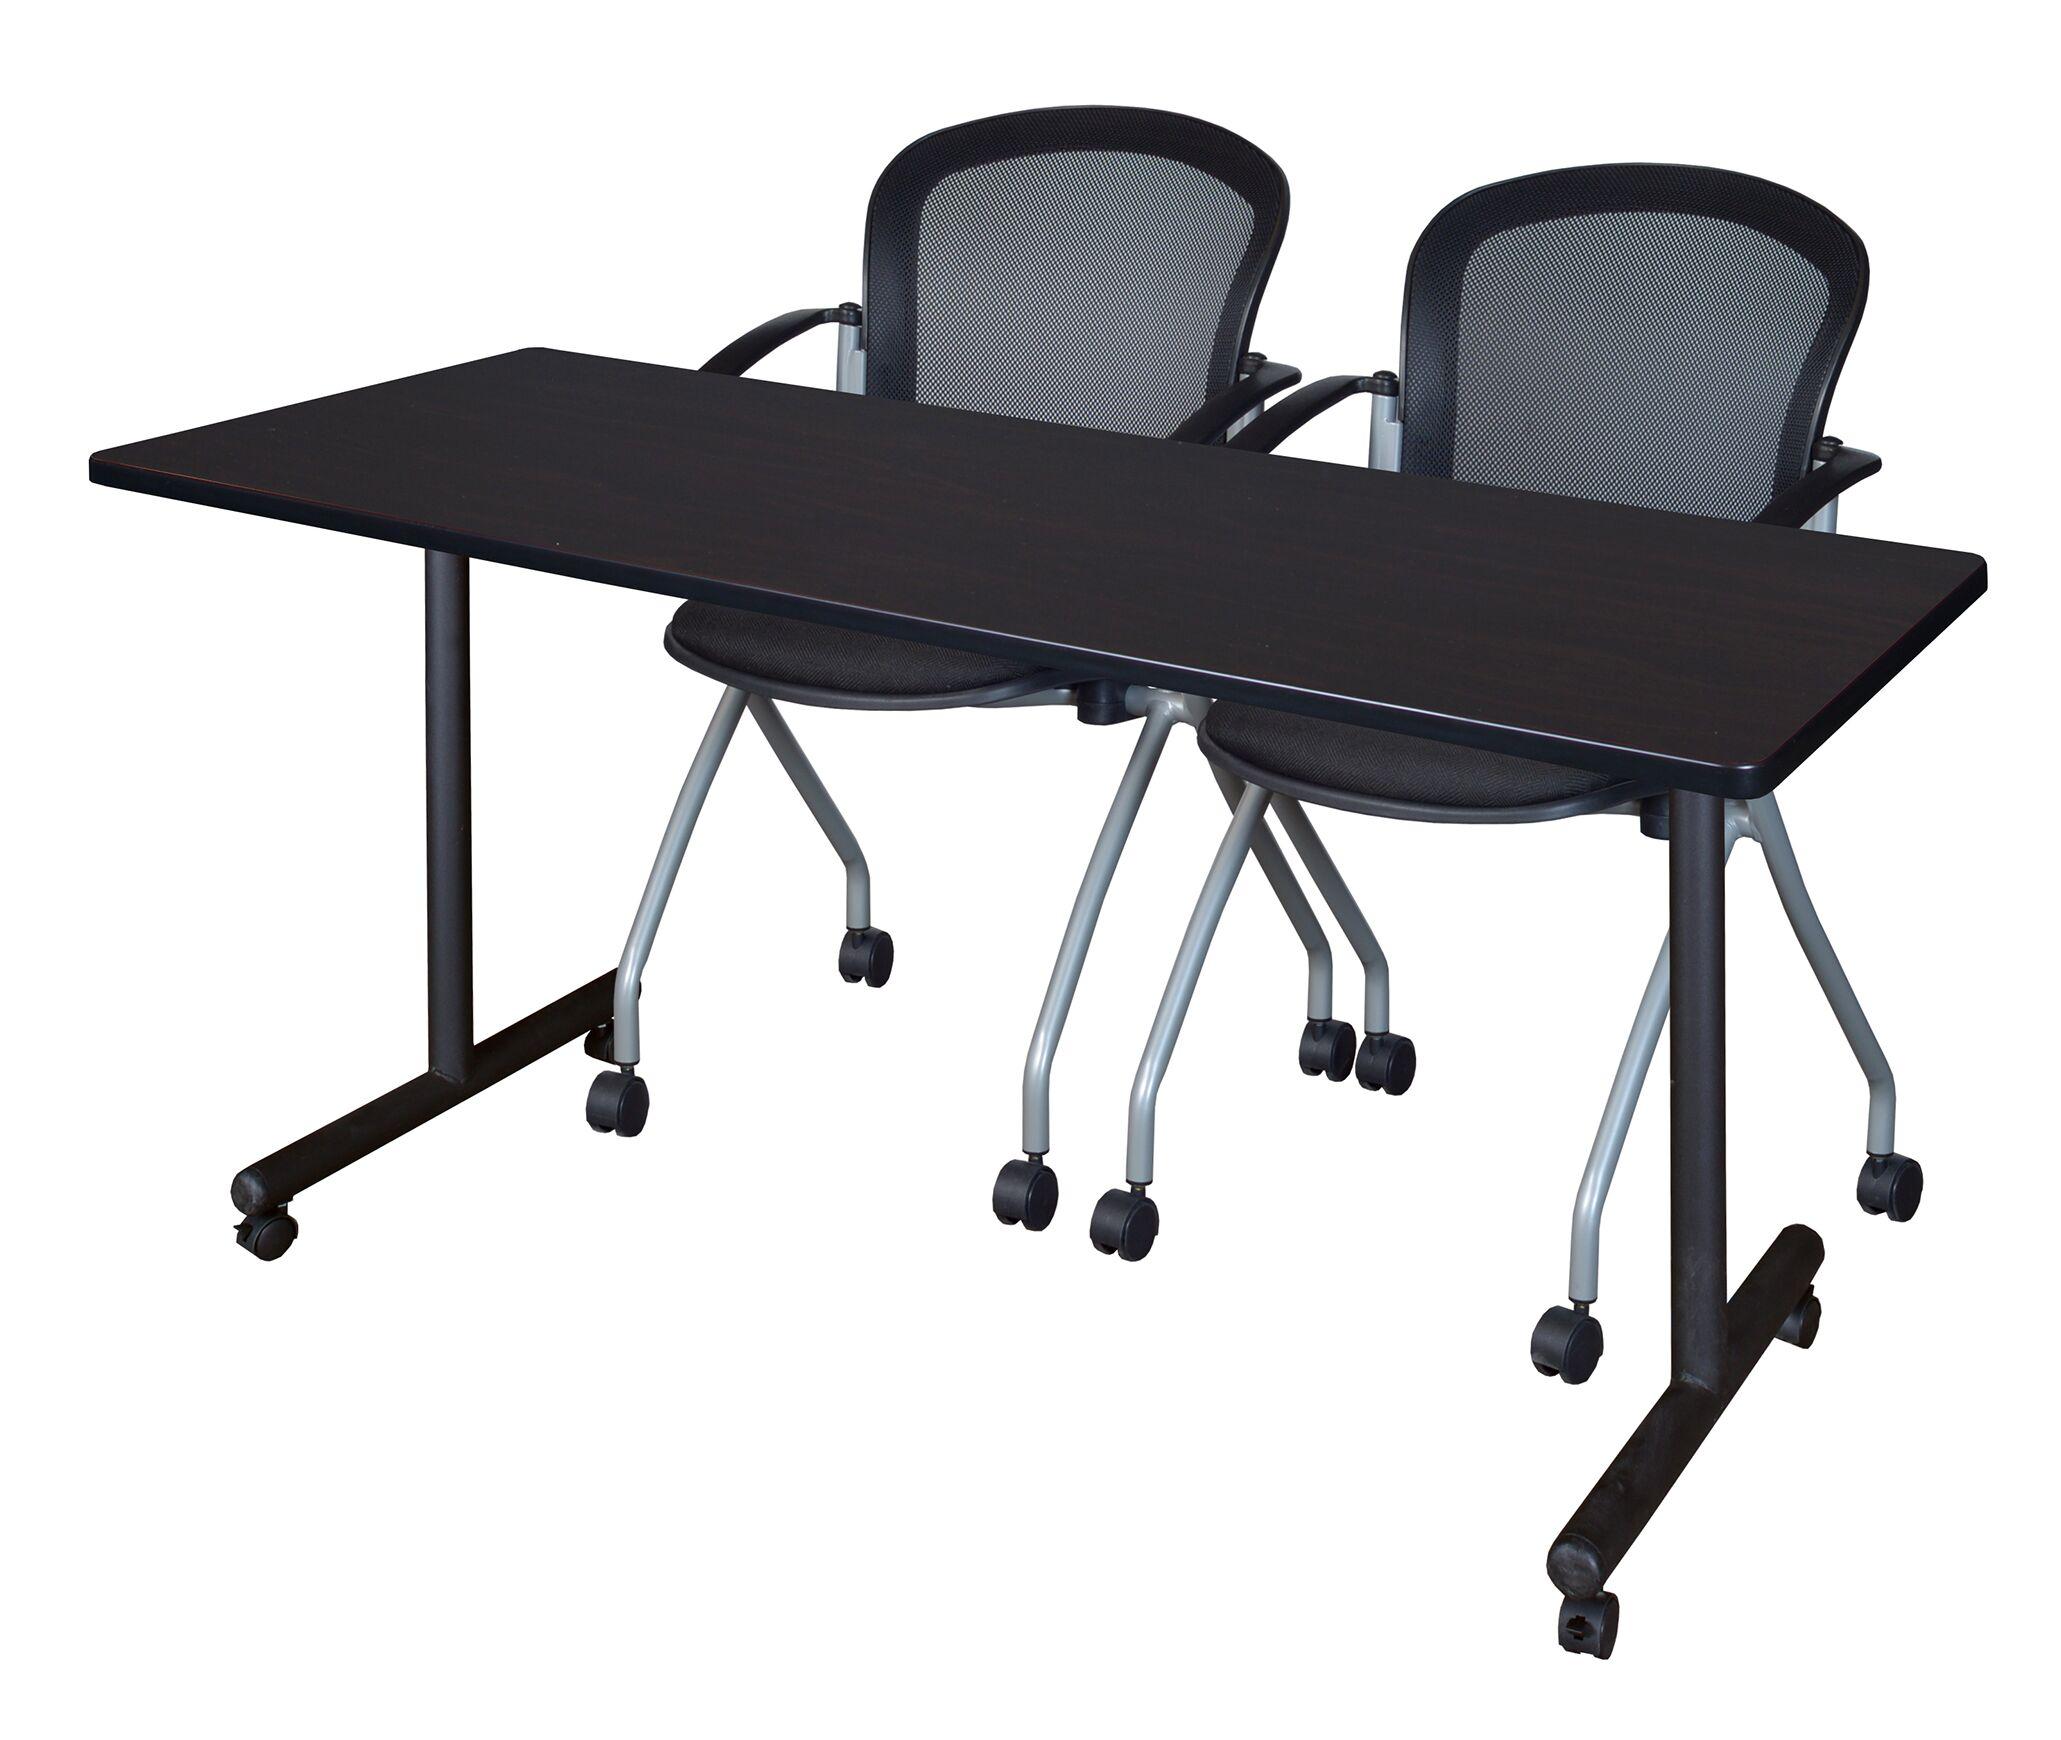 Marin Training Table Tabletop Finish: Mocha Walnut, Size: 29